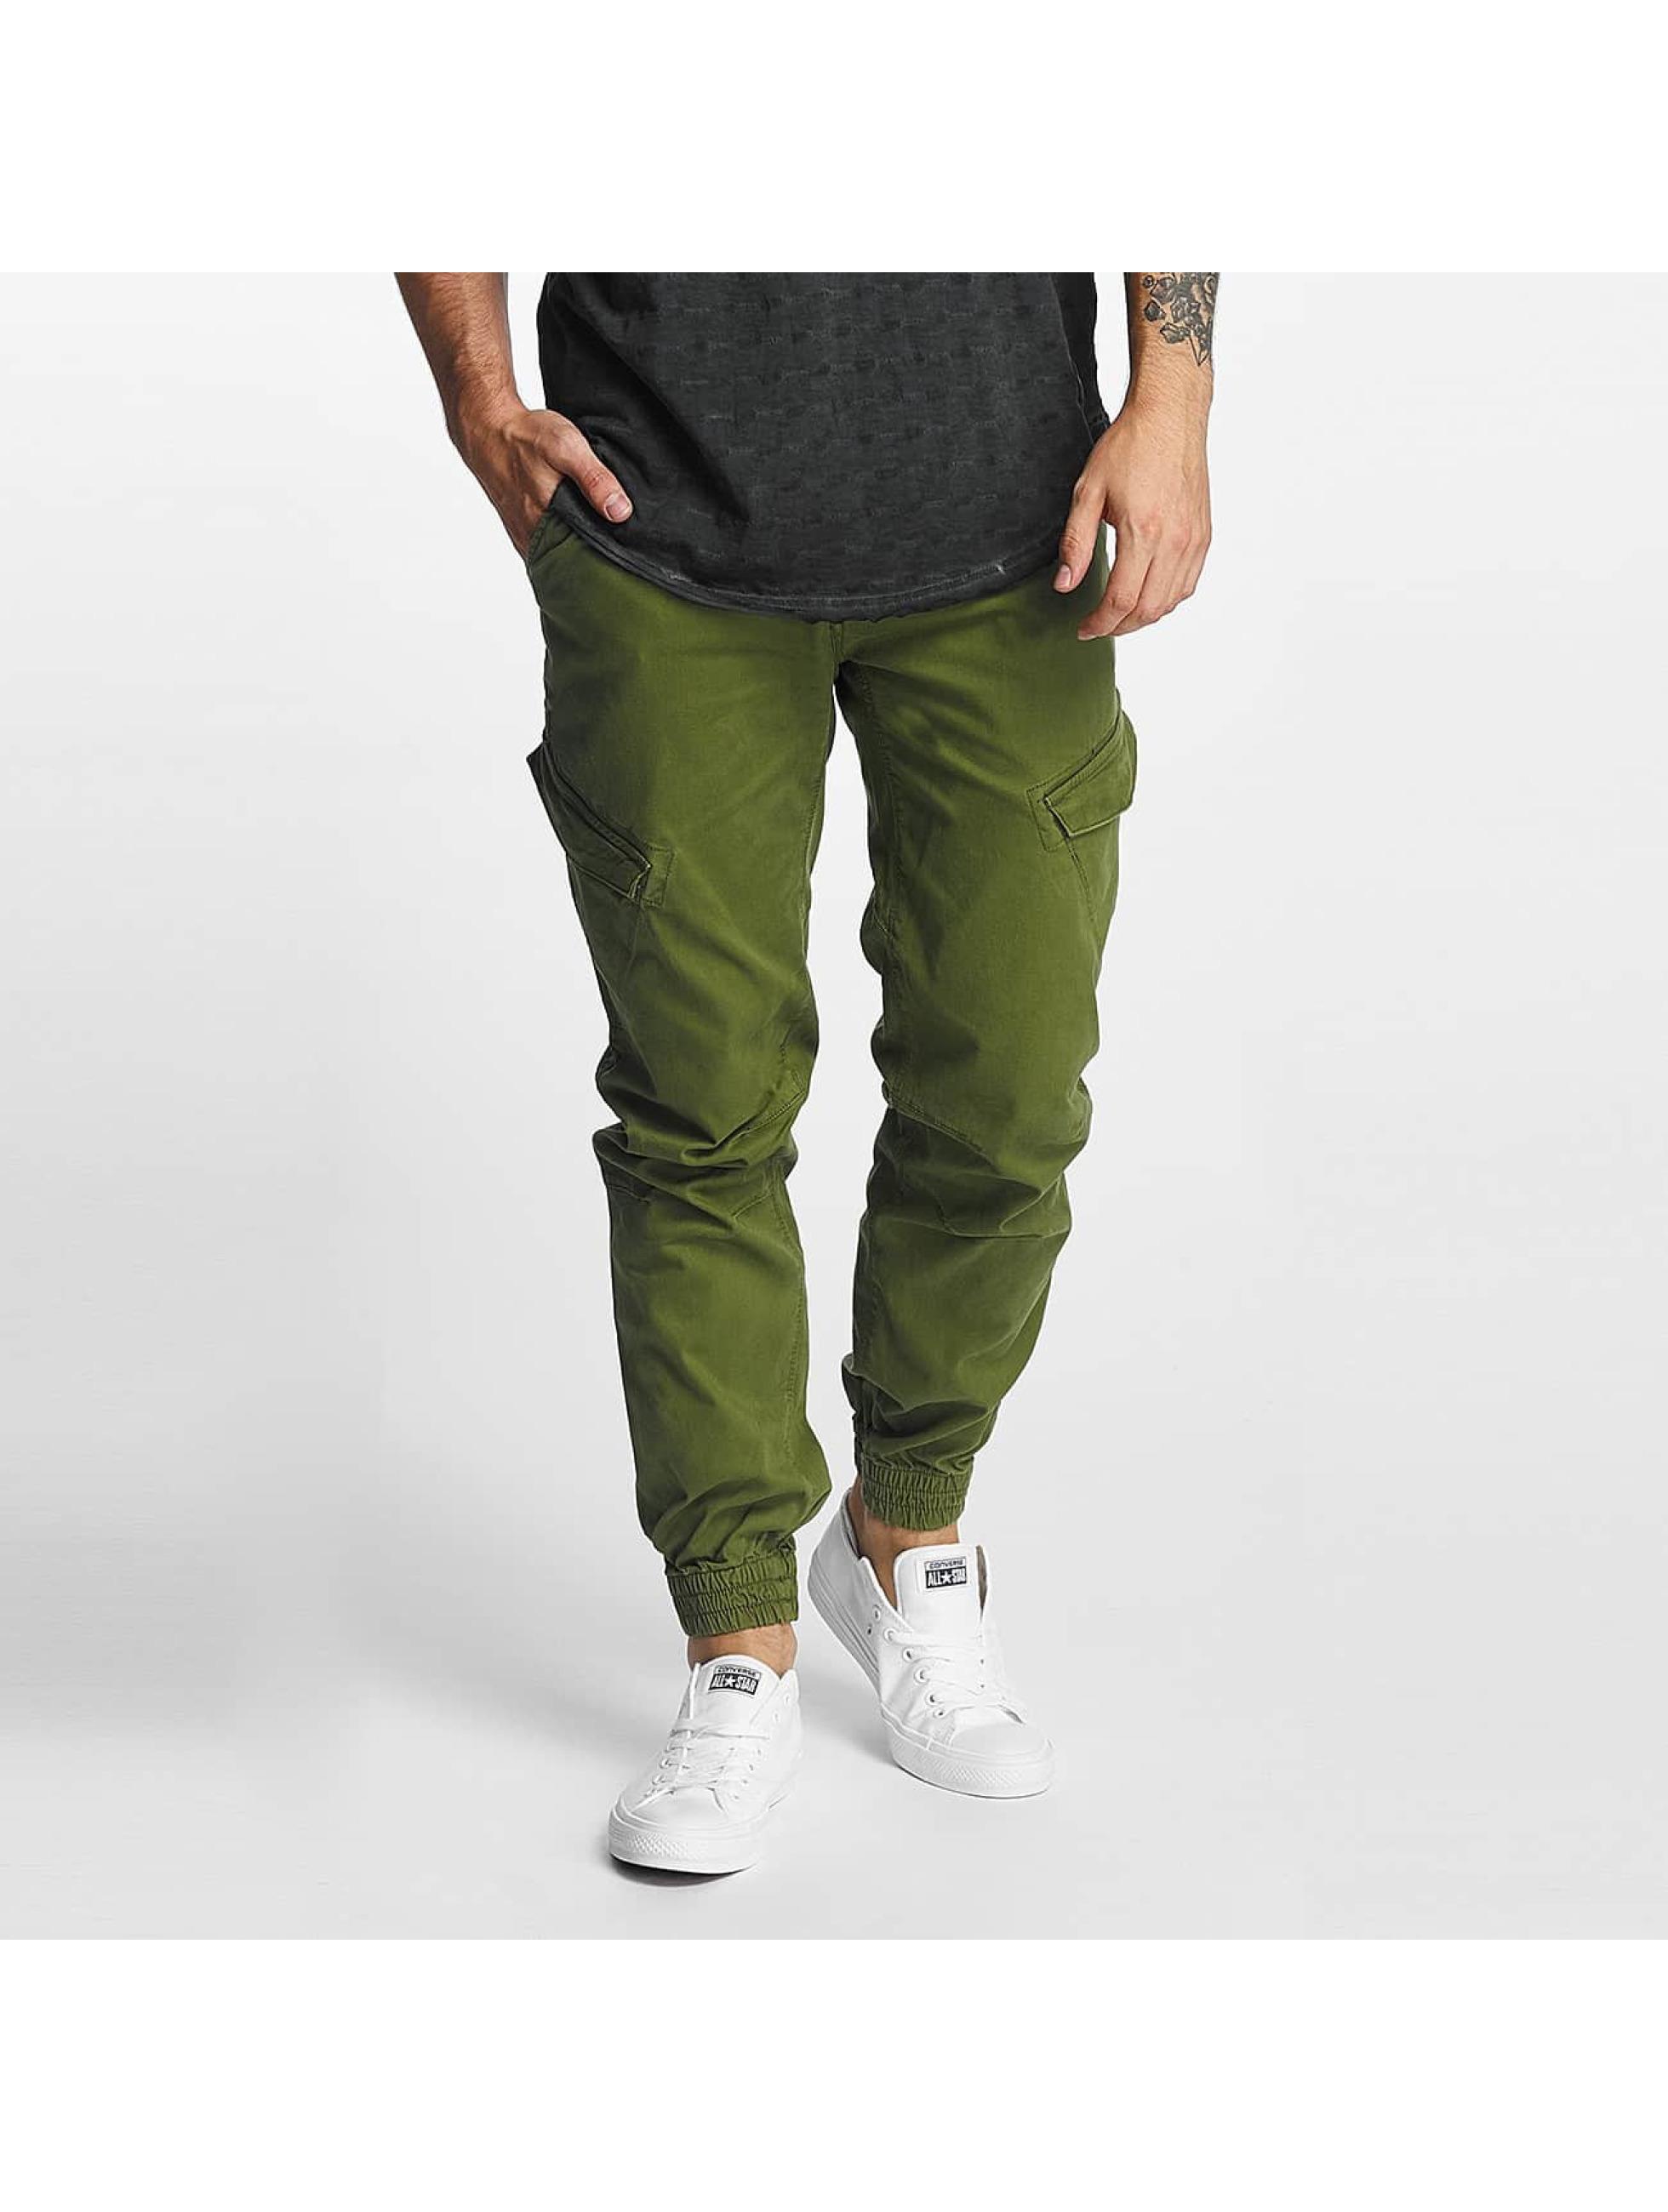 SHINE Original Cargobroek Slim groen